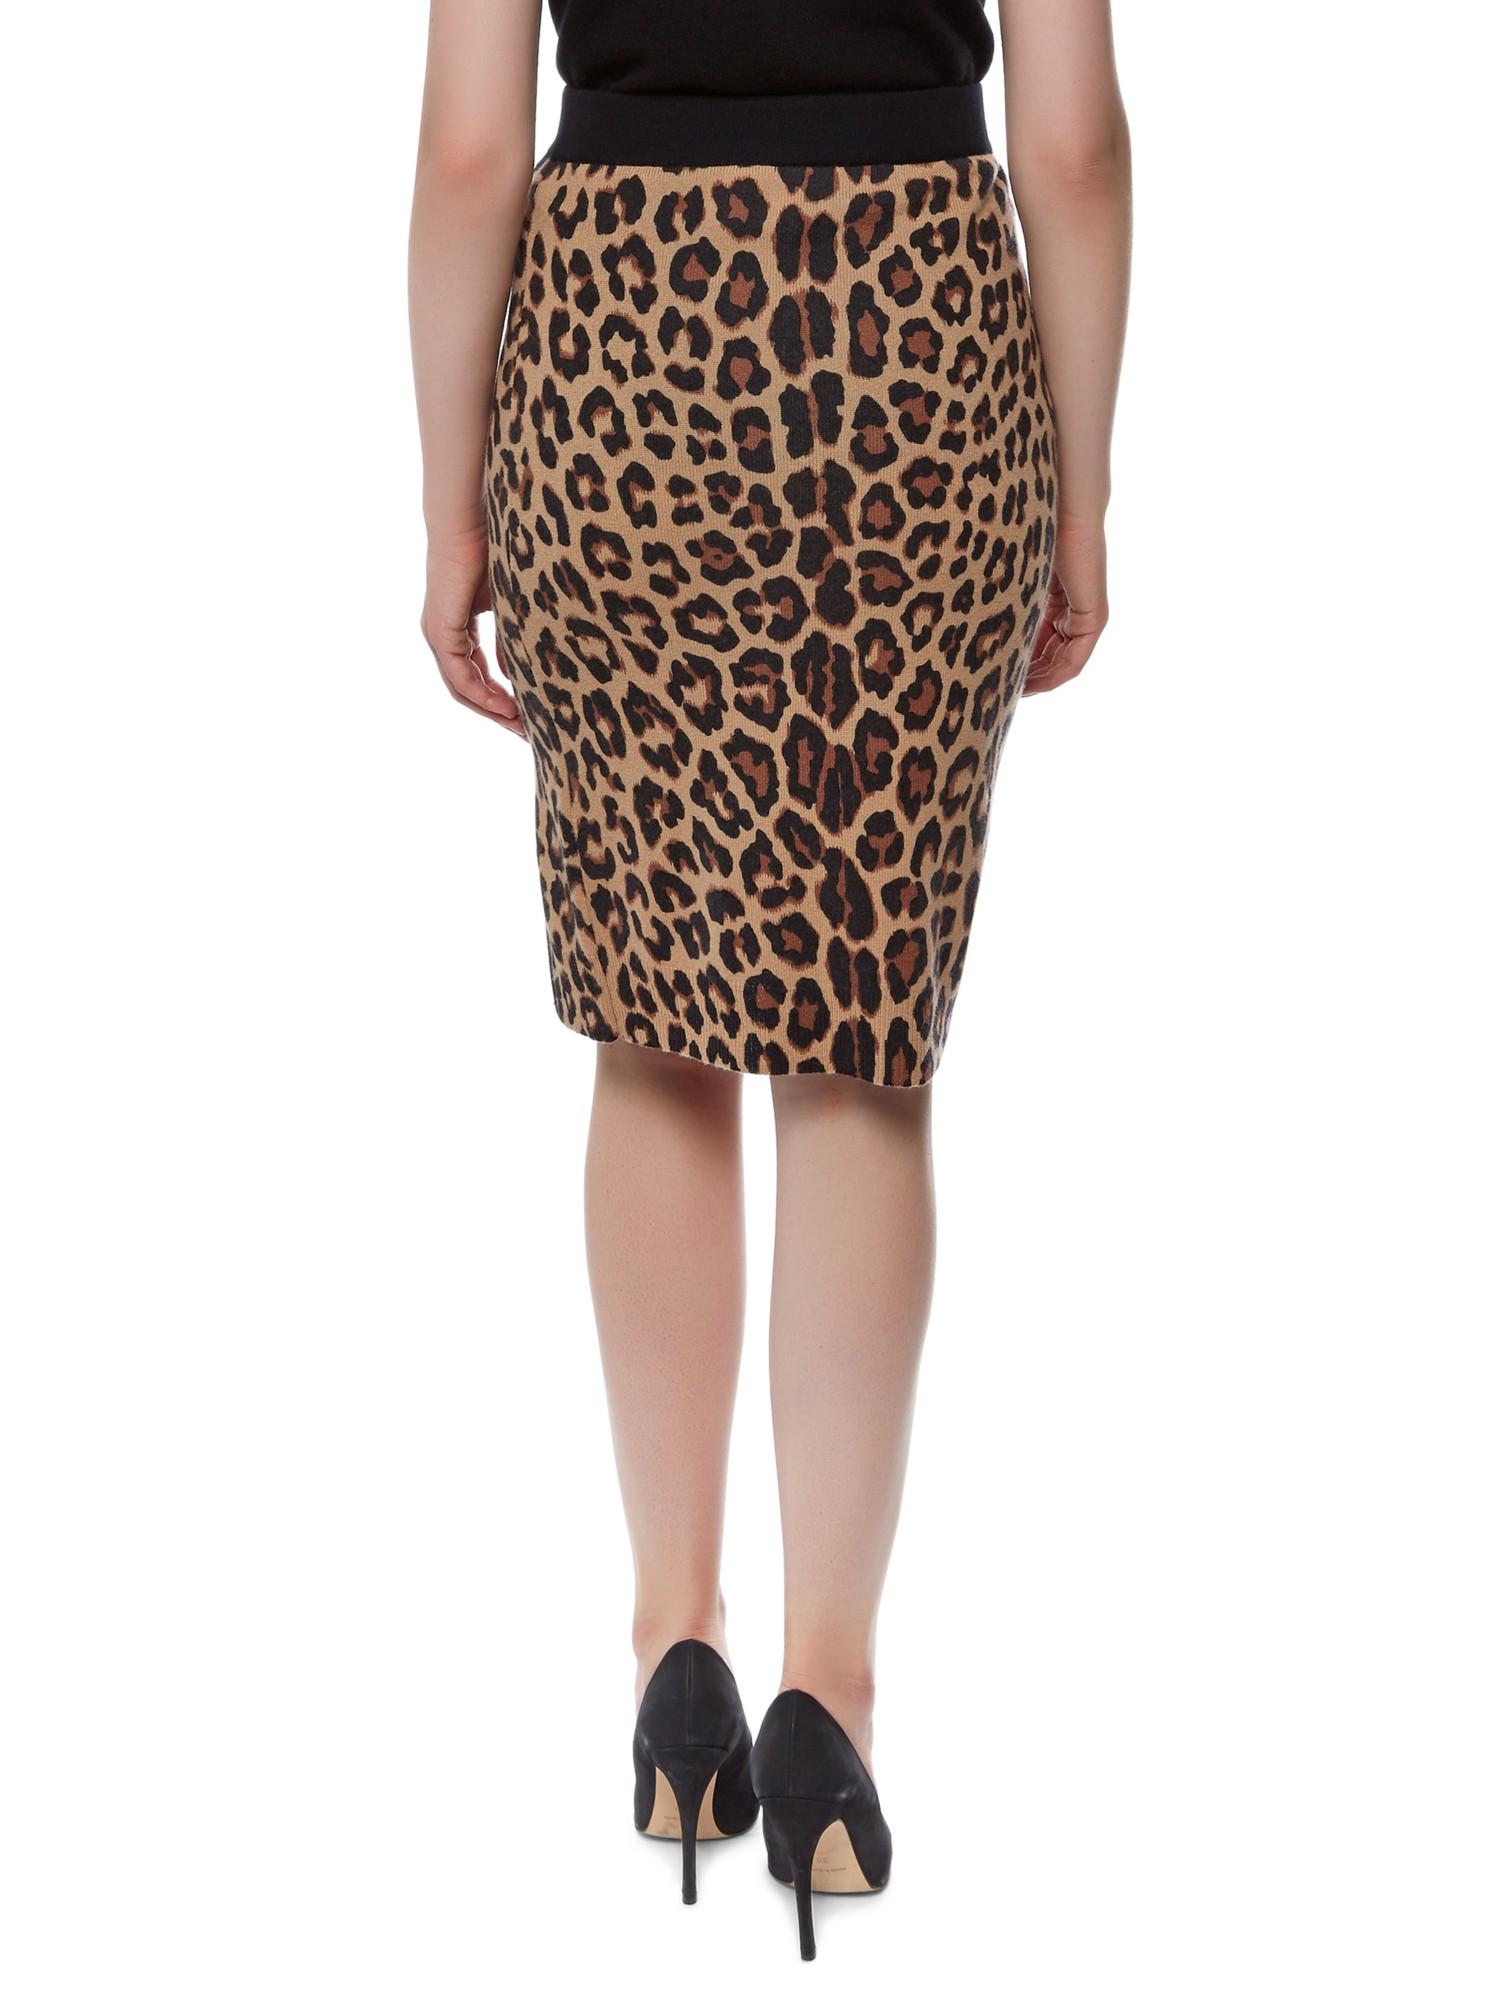 Jaeger Leopard Print Skirt Lyst